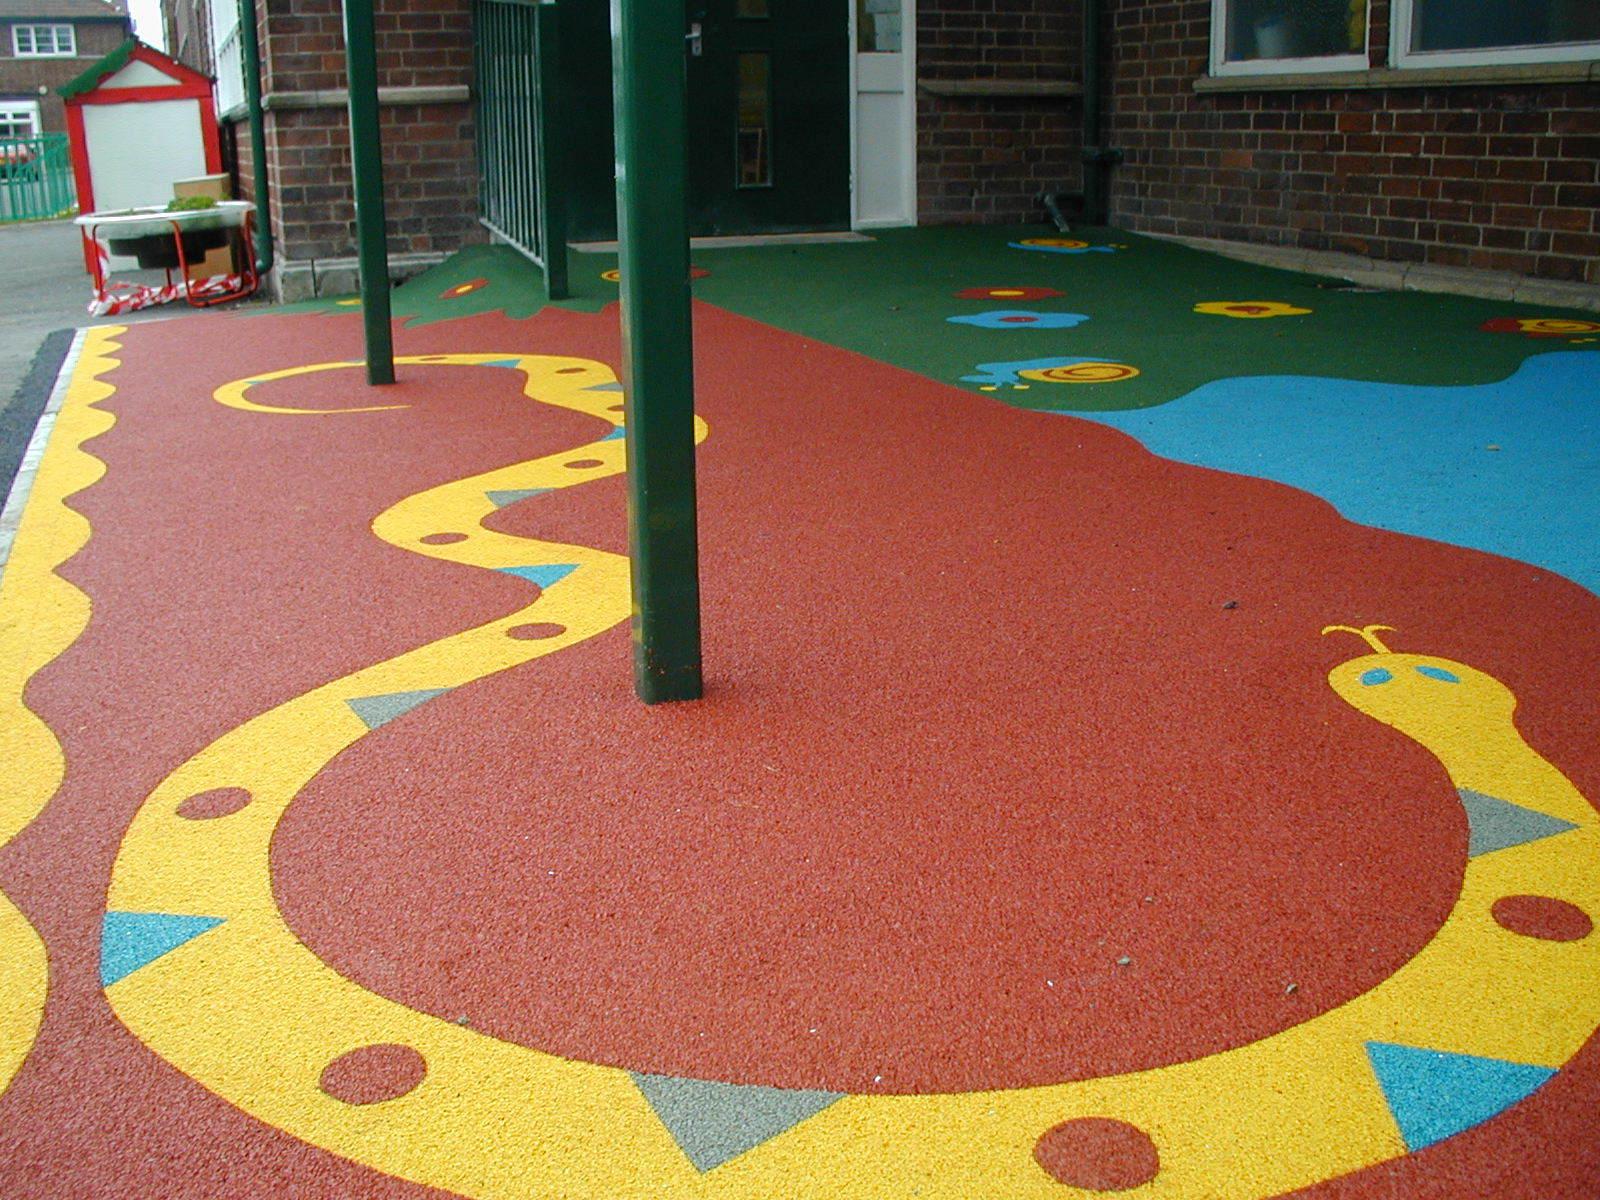 EPDM儿童地垫厂家直销 EPDM儿童地垫哪家好 EPDM儿童地垫价格优惠